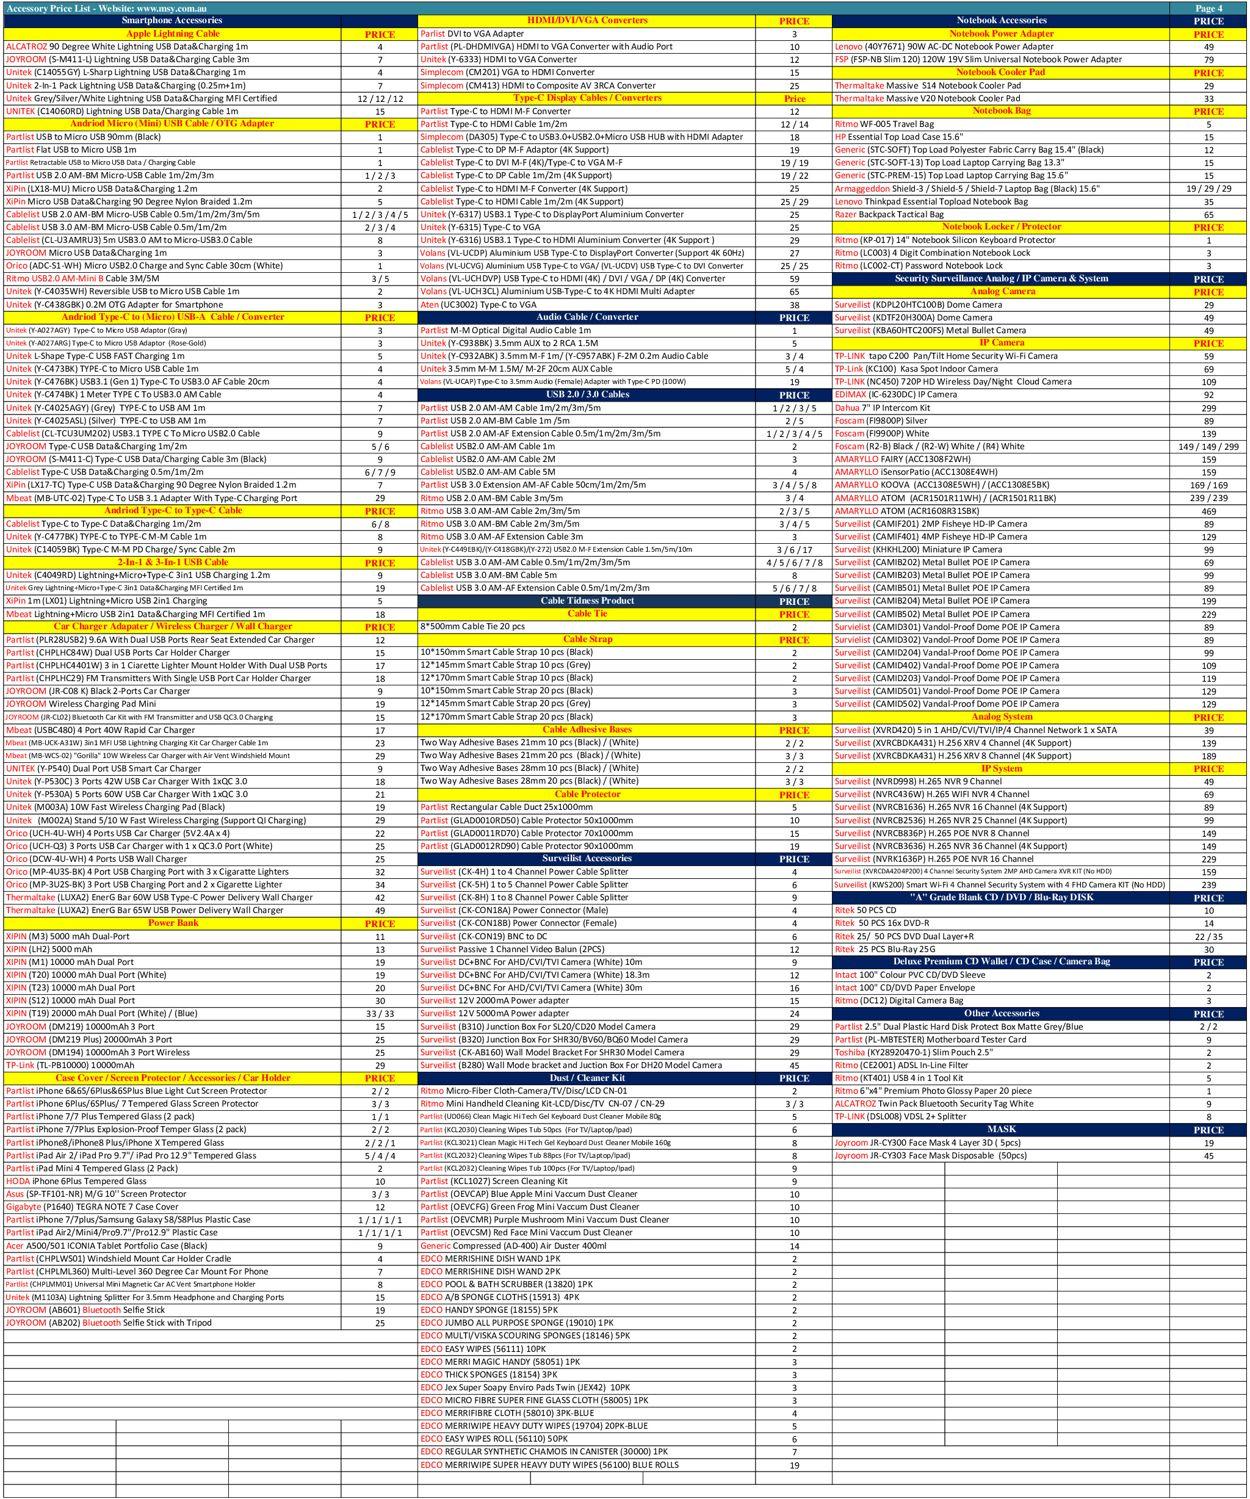 MSY Technology Catalogue - 17/09-17/09/2020 (Page 4)